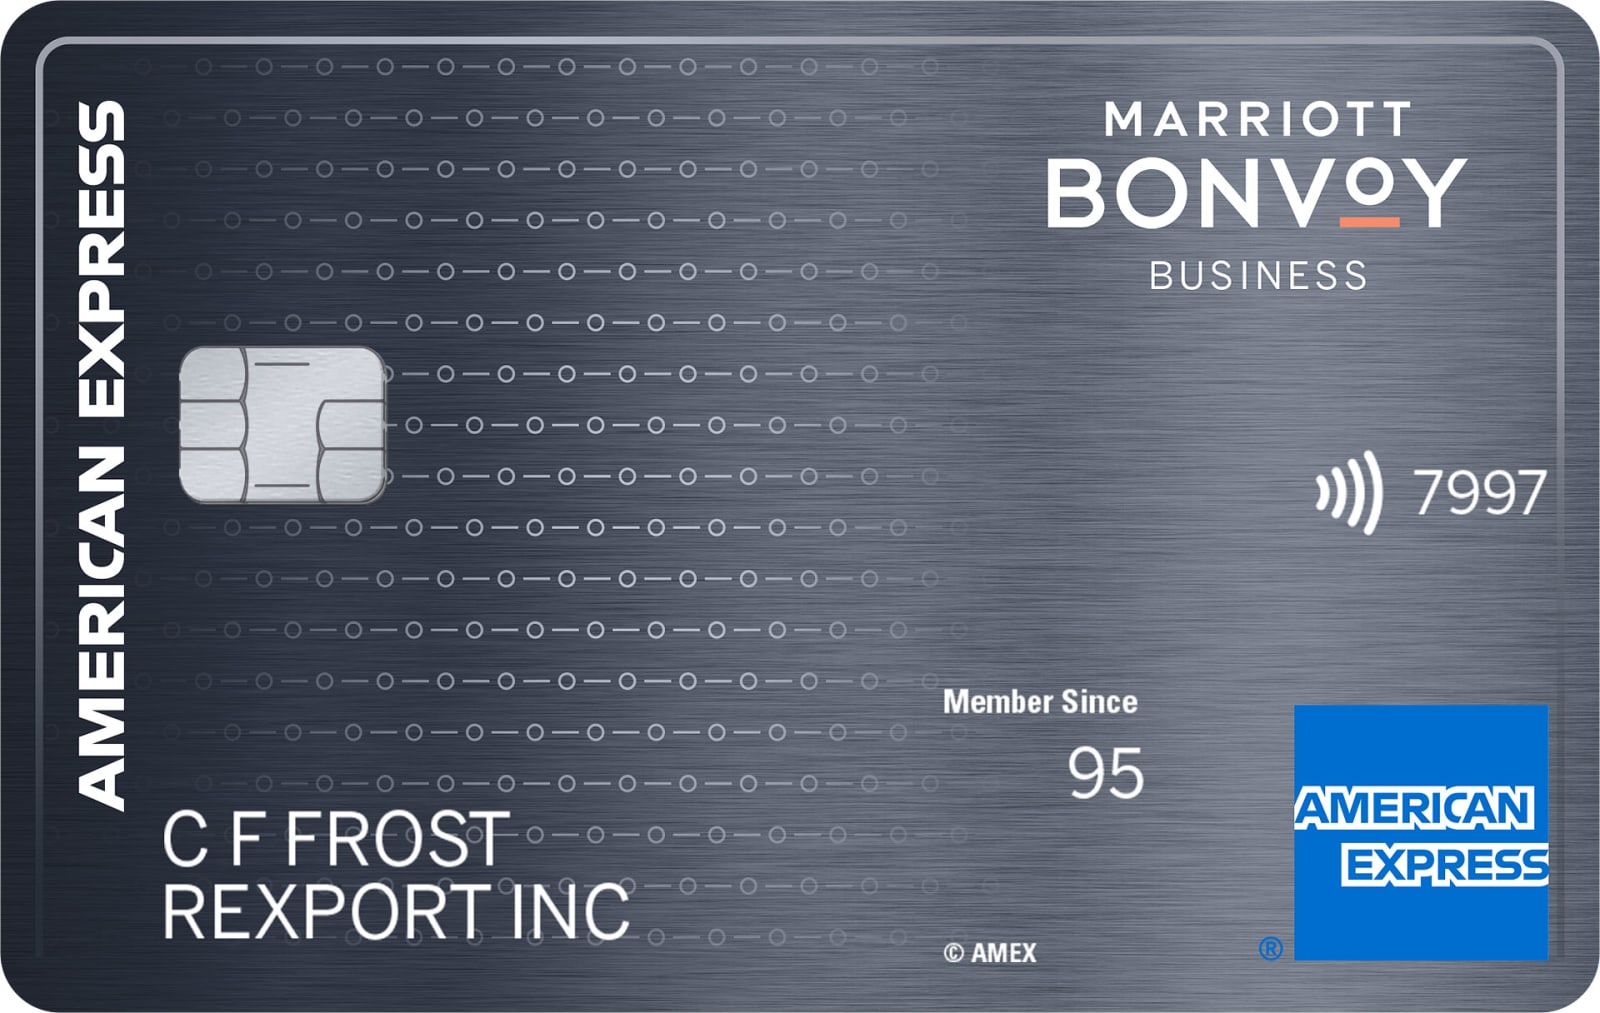 Marriott Bonvoy Rewards Program: Everything You Need to Know